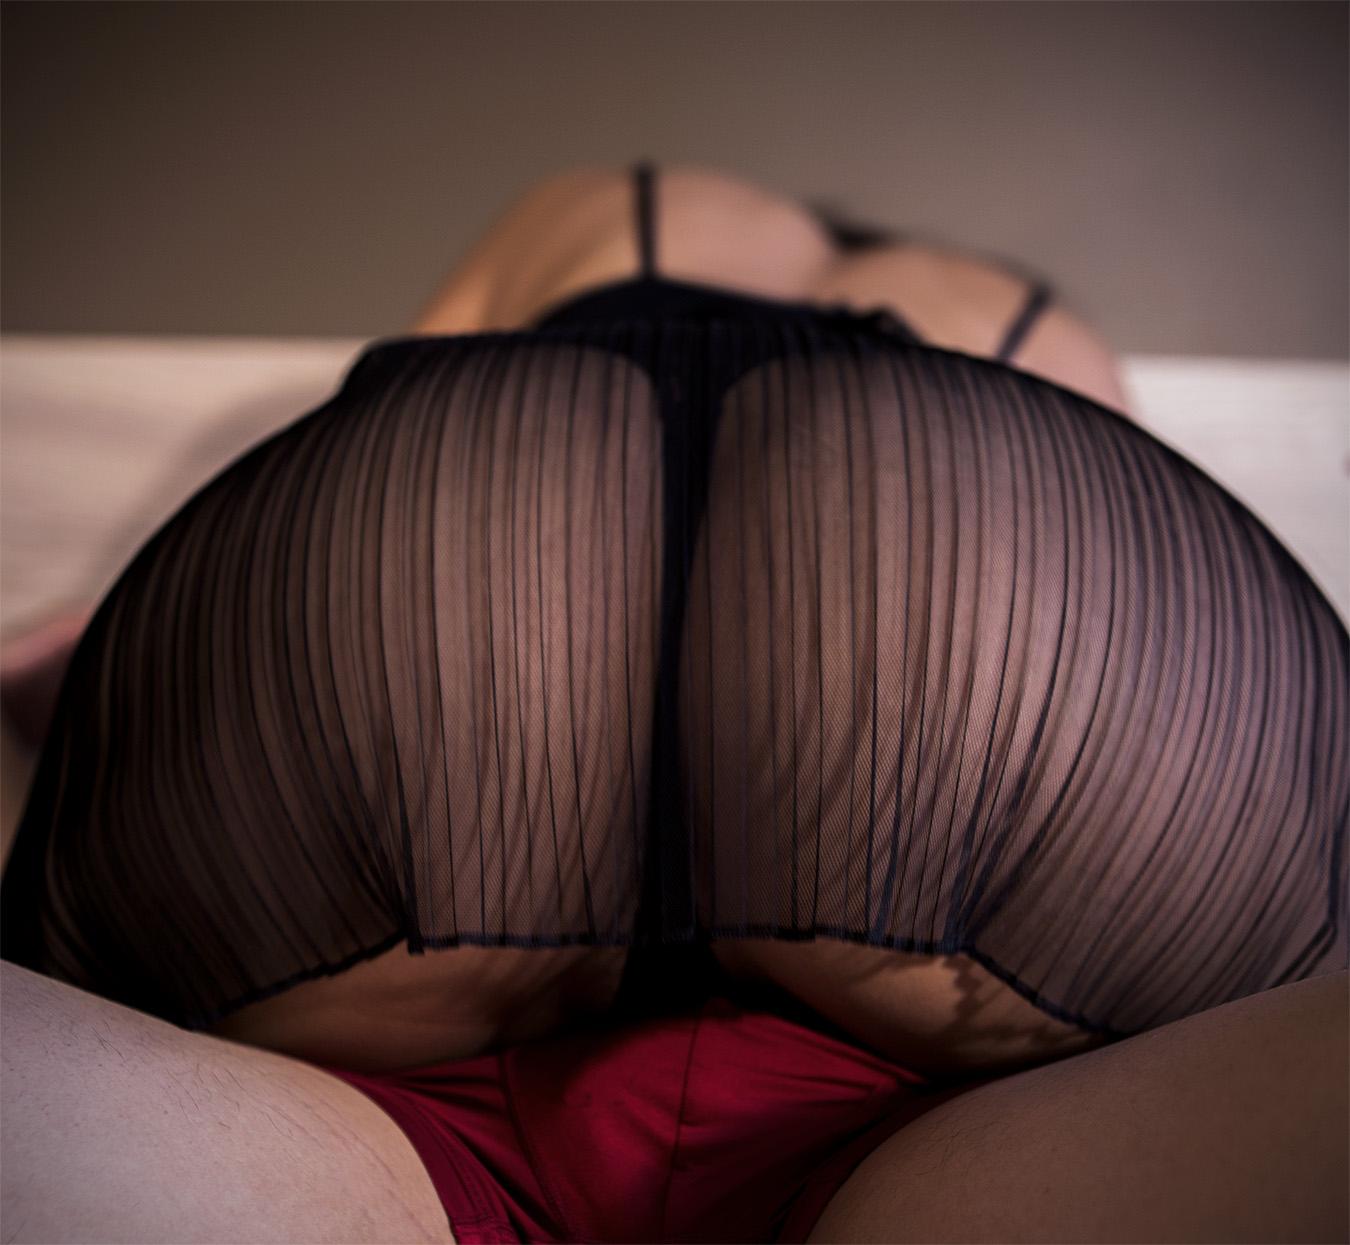 Amber_Shi_erotic_photography_closeup_red_black_devil_angel